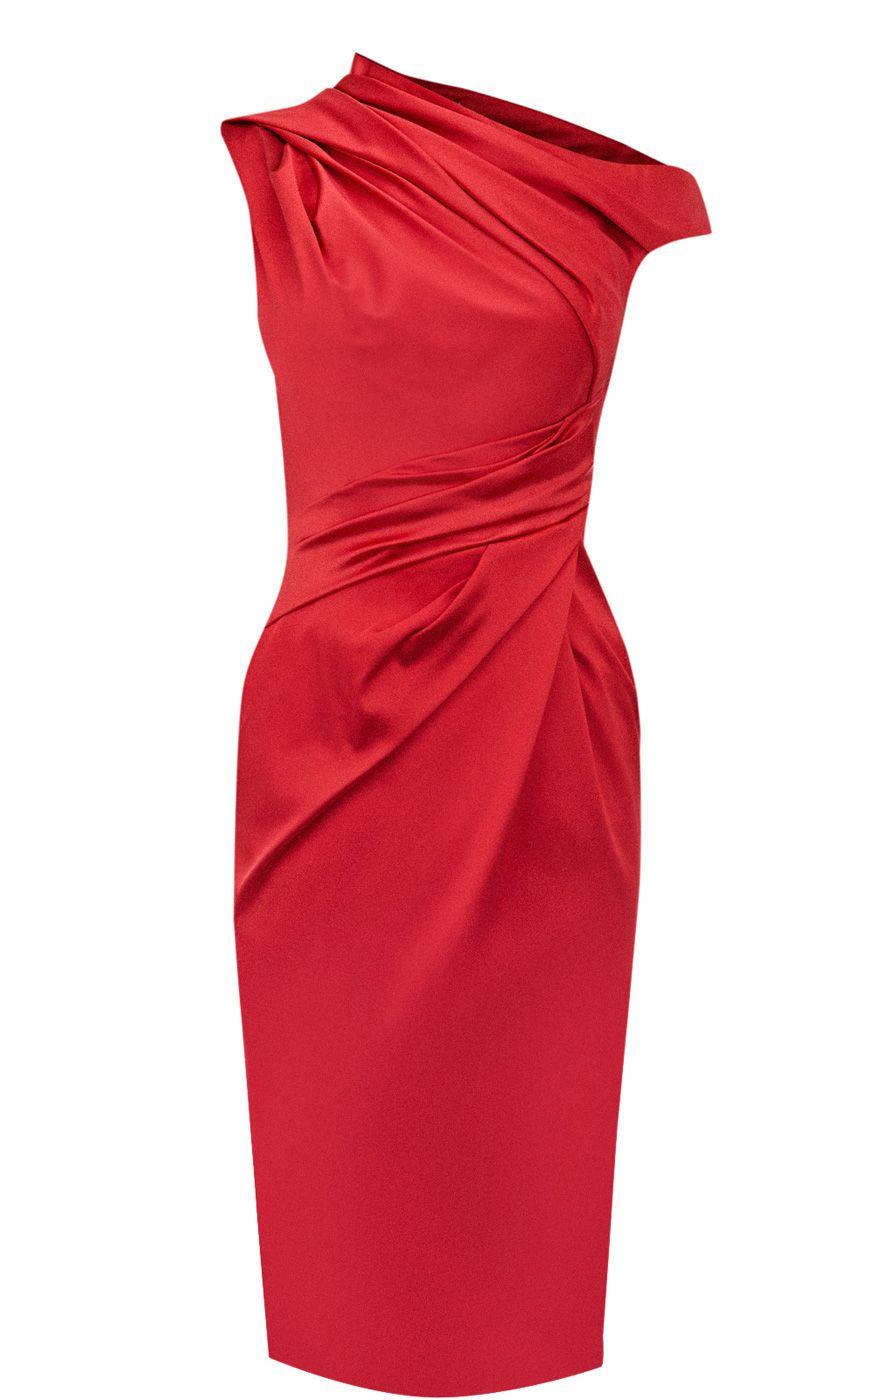 Karen millen Signature Stretch Satin Dress in Natural | Lyst